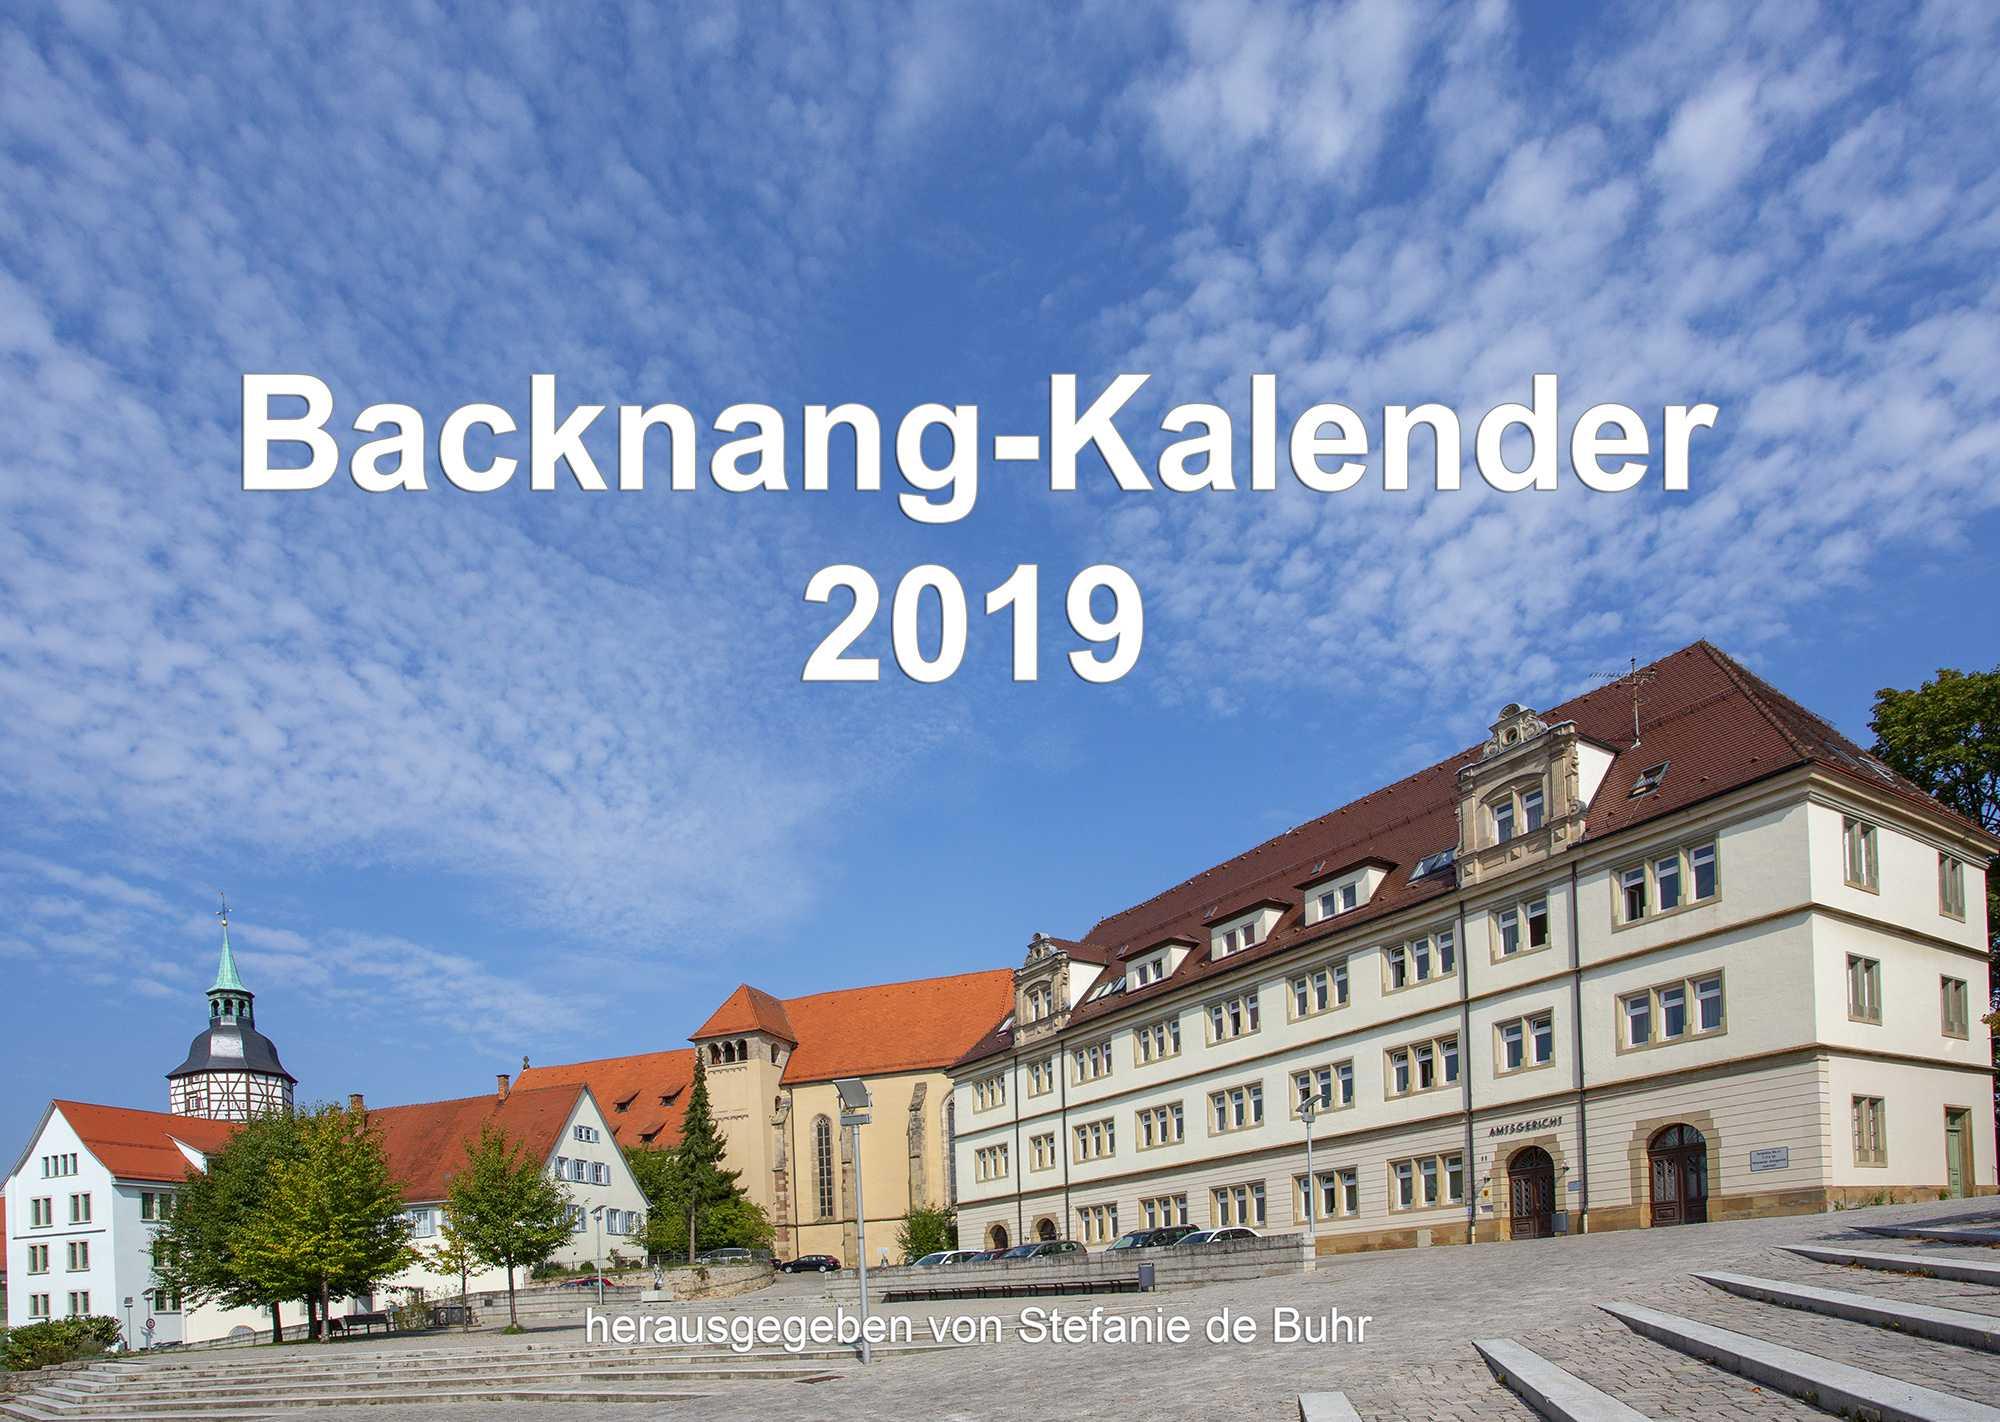 Backnang-Kalender 2019